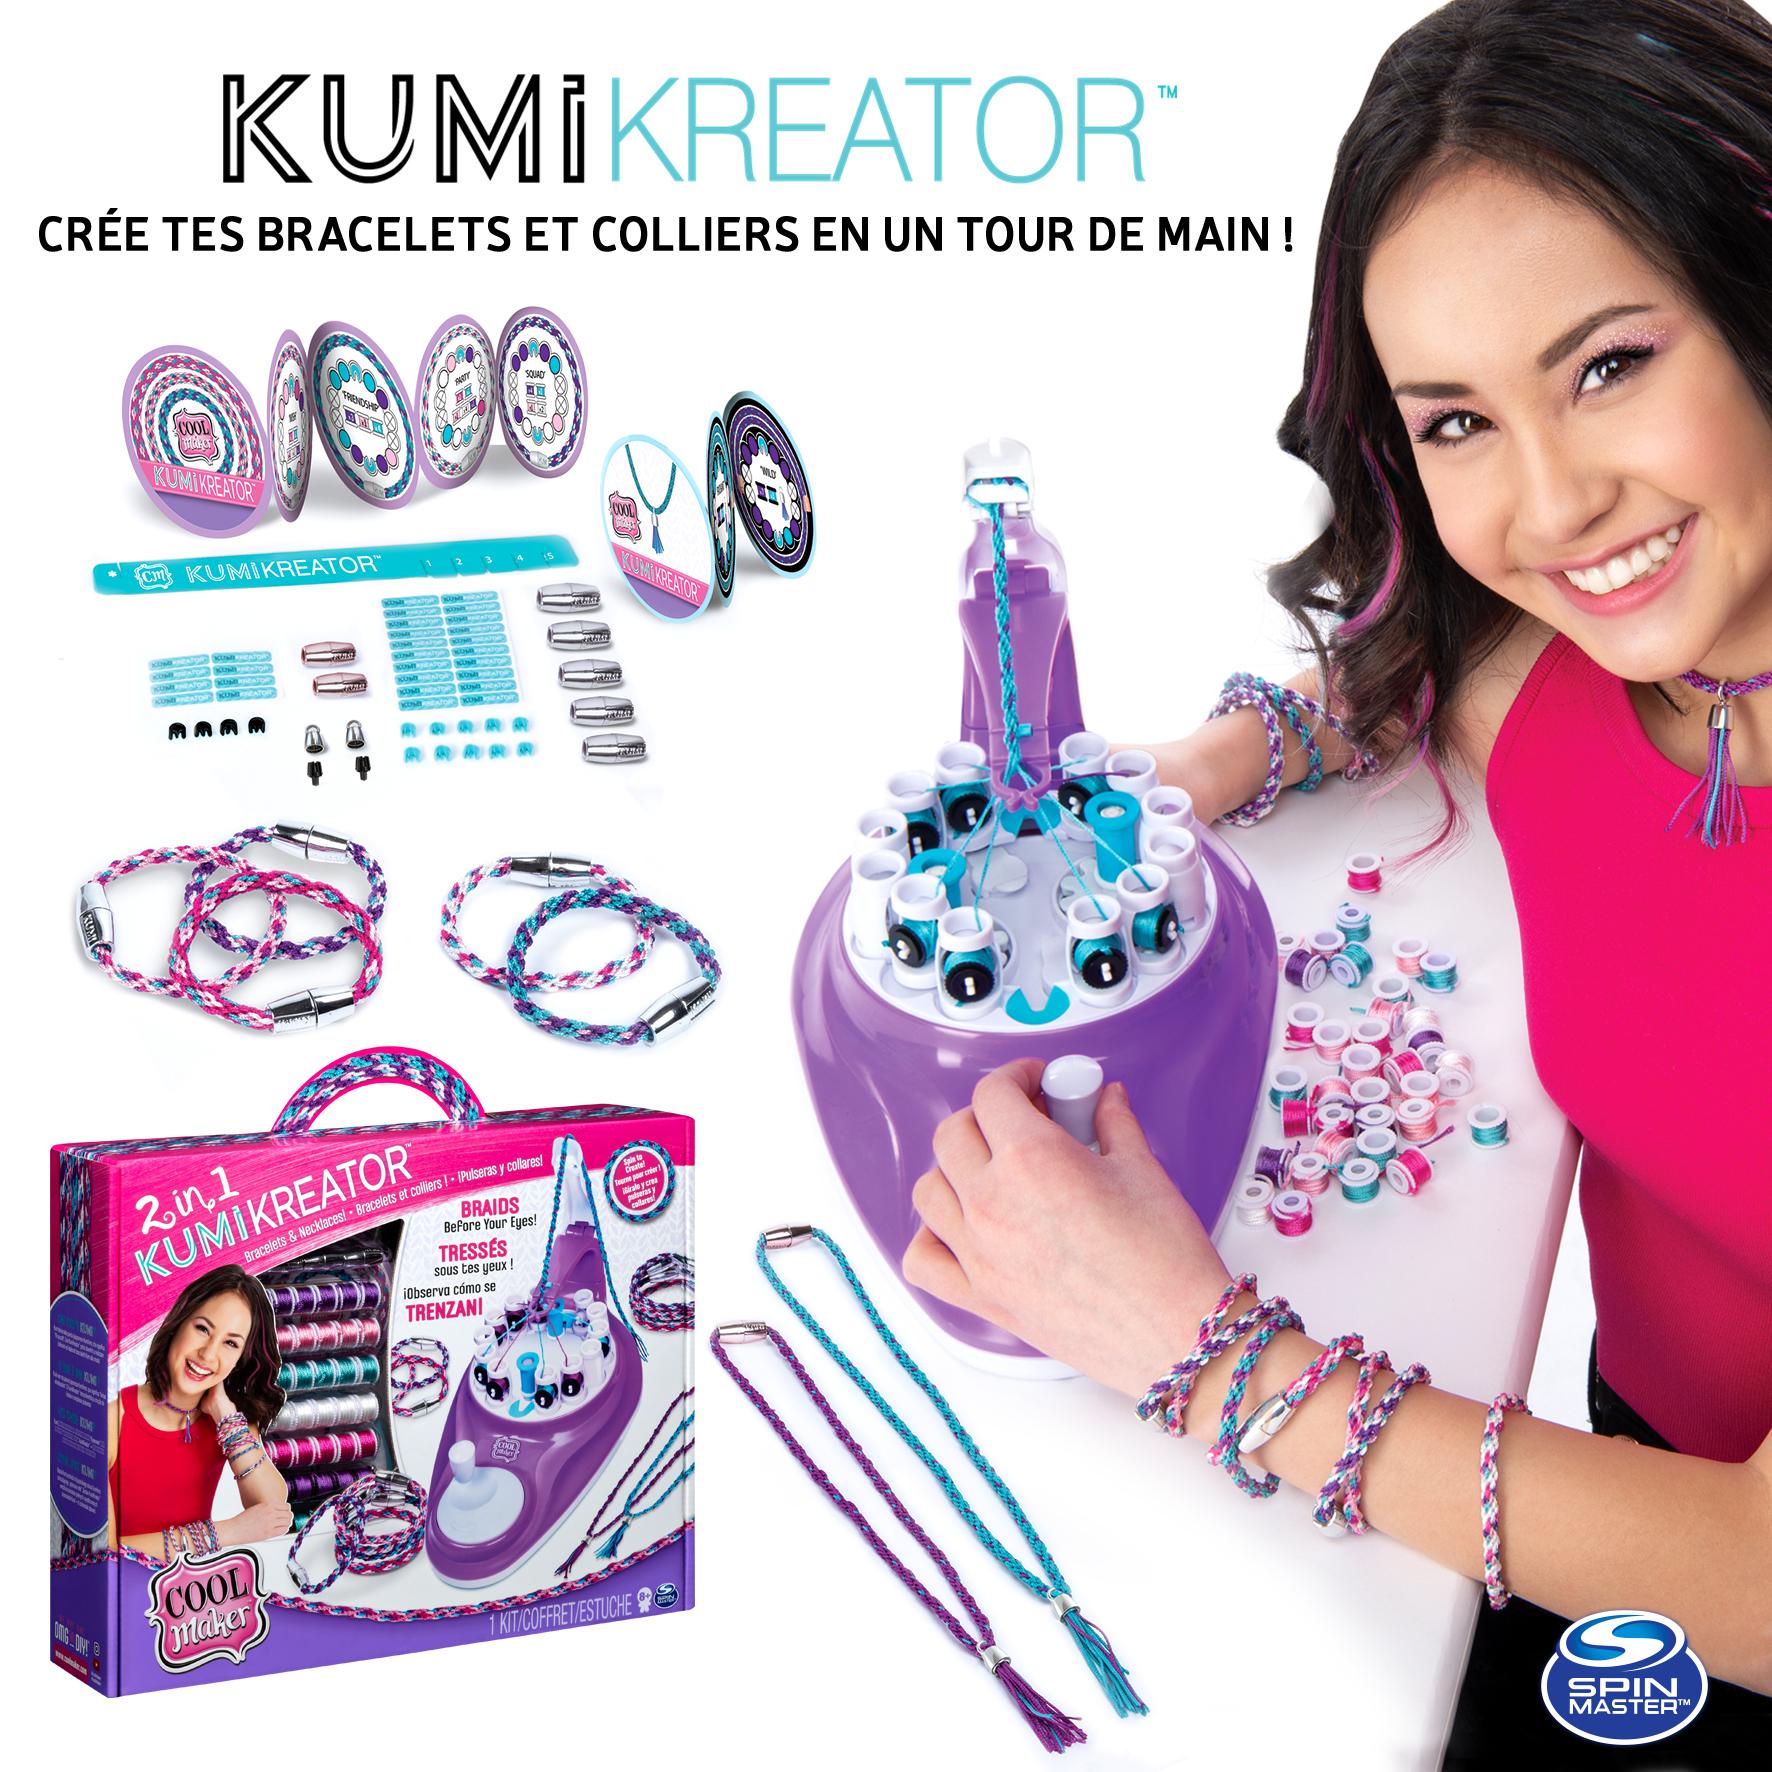 Kumi Kreator Deluxe